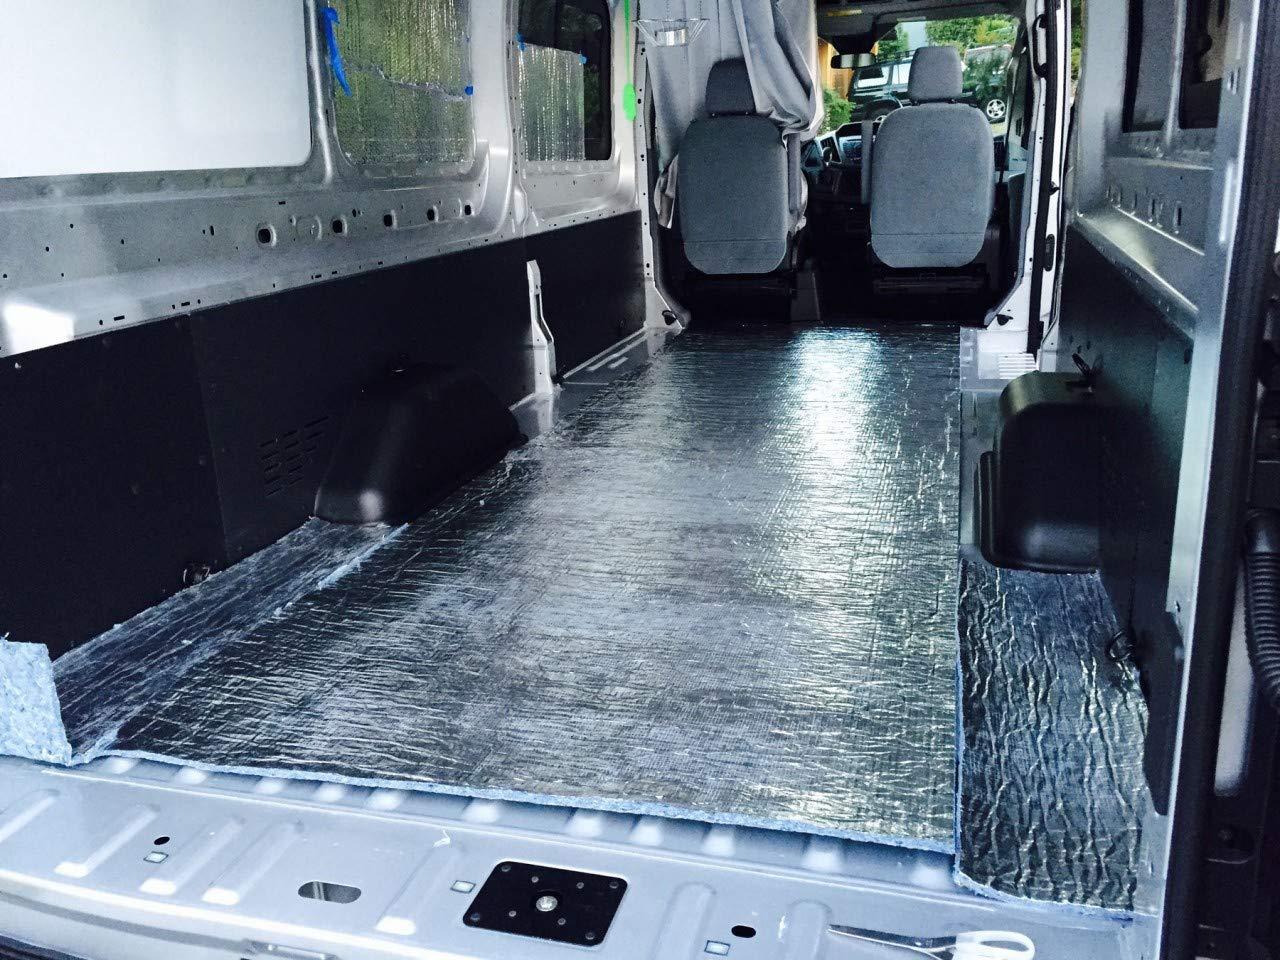 Super Shield EZ Cool Car Van Truck RV SUV Vehicle Insulation 4' x 12.5' Roll 50 Sqft Sound Noise Dampening Deadener Heat Barrier Mat Automotive Thermal Insulation (Made in USA) R Value 7